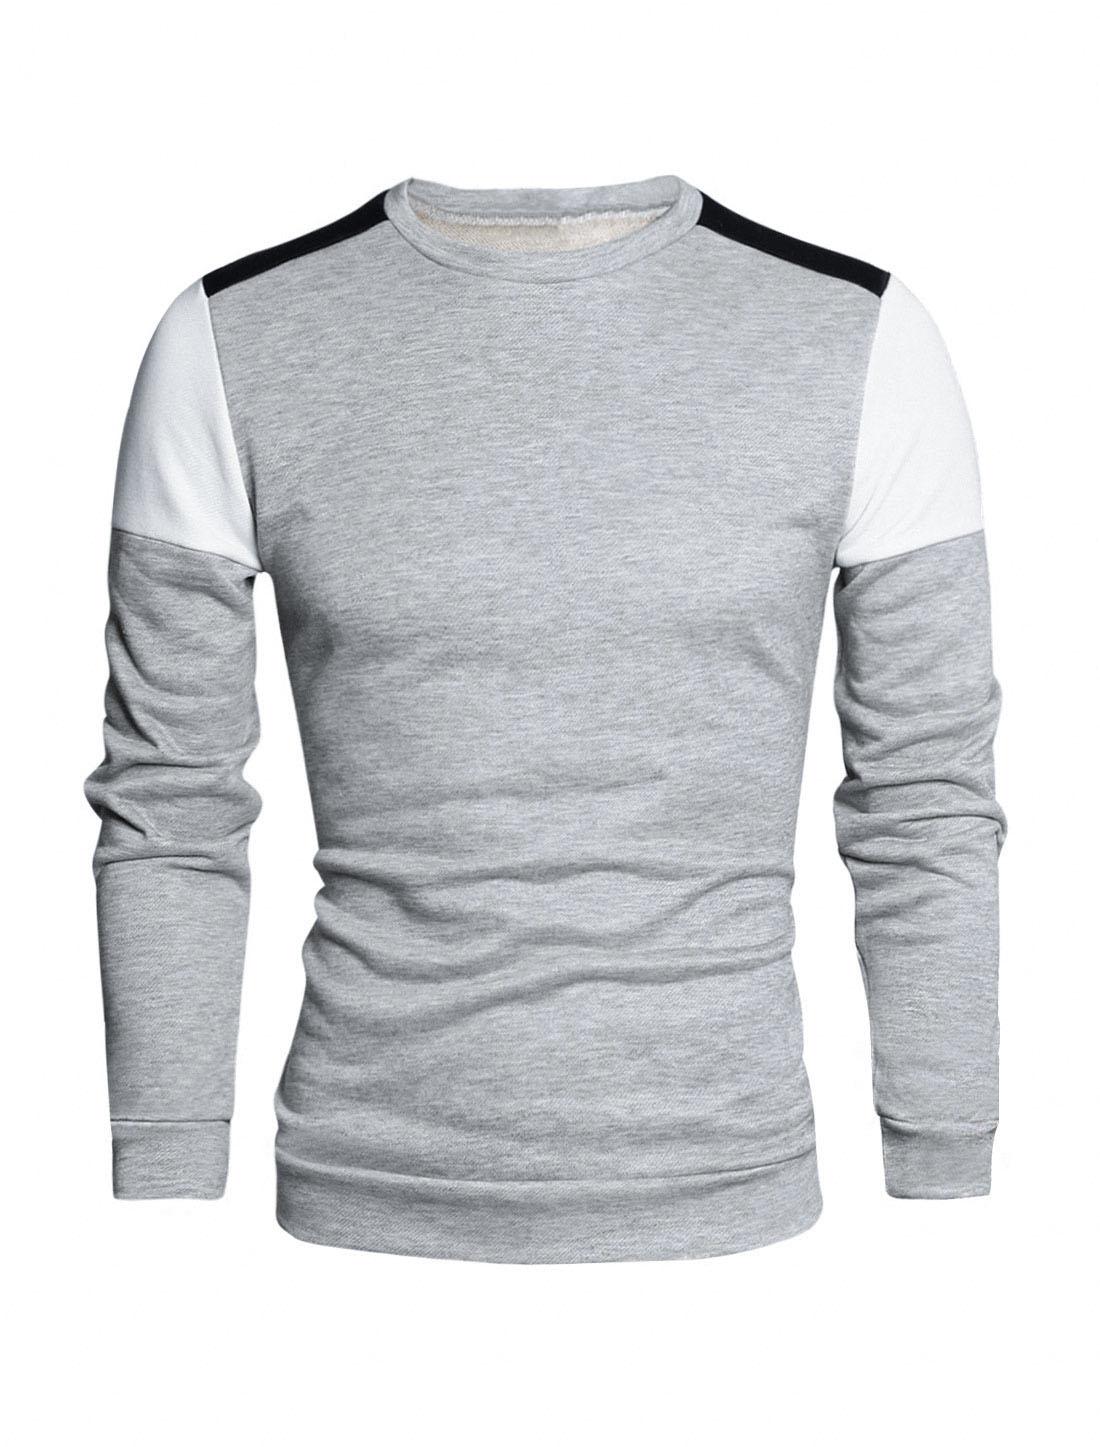 Men Color Block Crew Neck Long Sleeves Regular Fit T-shirt Light Gray M